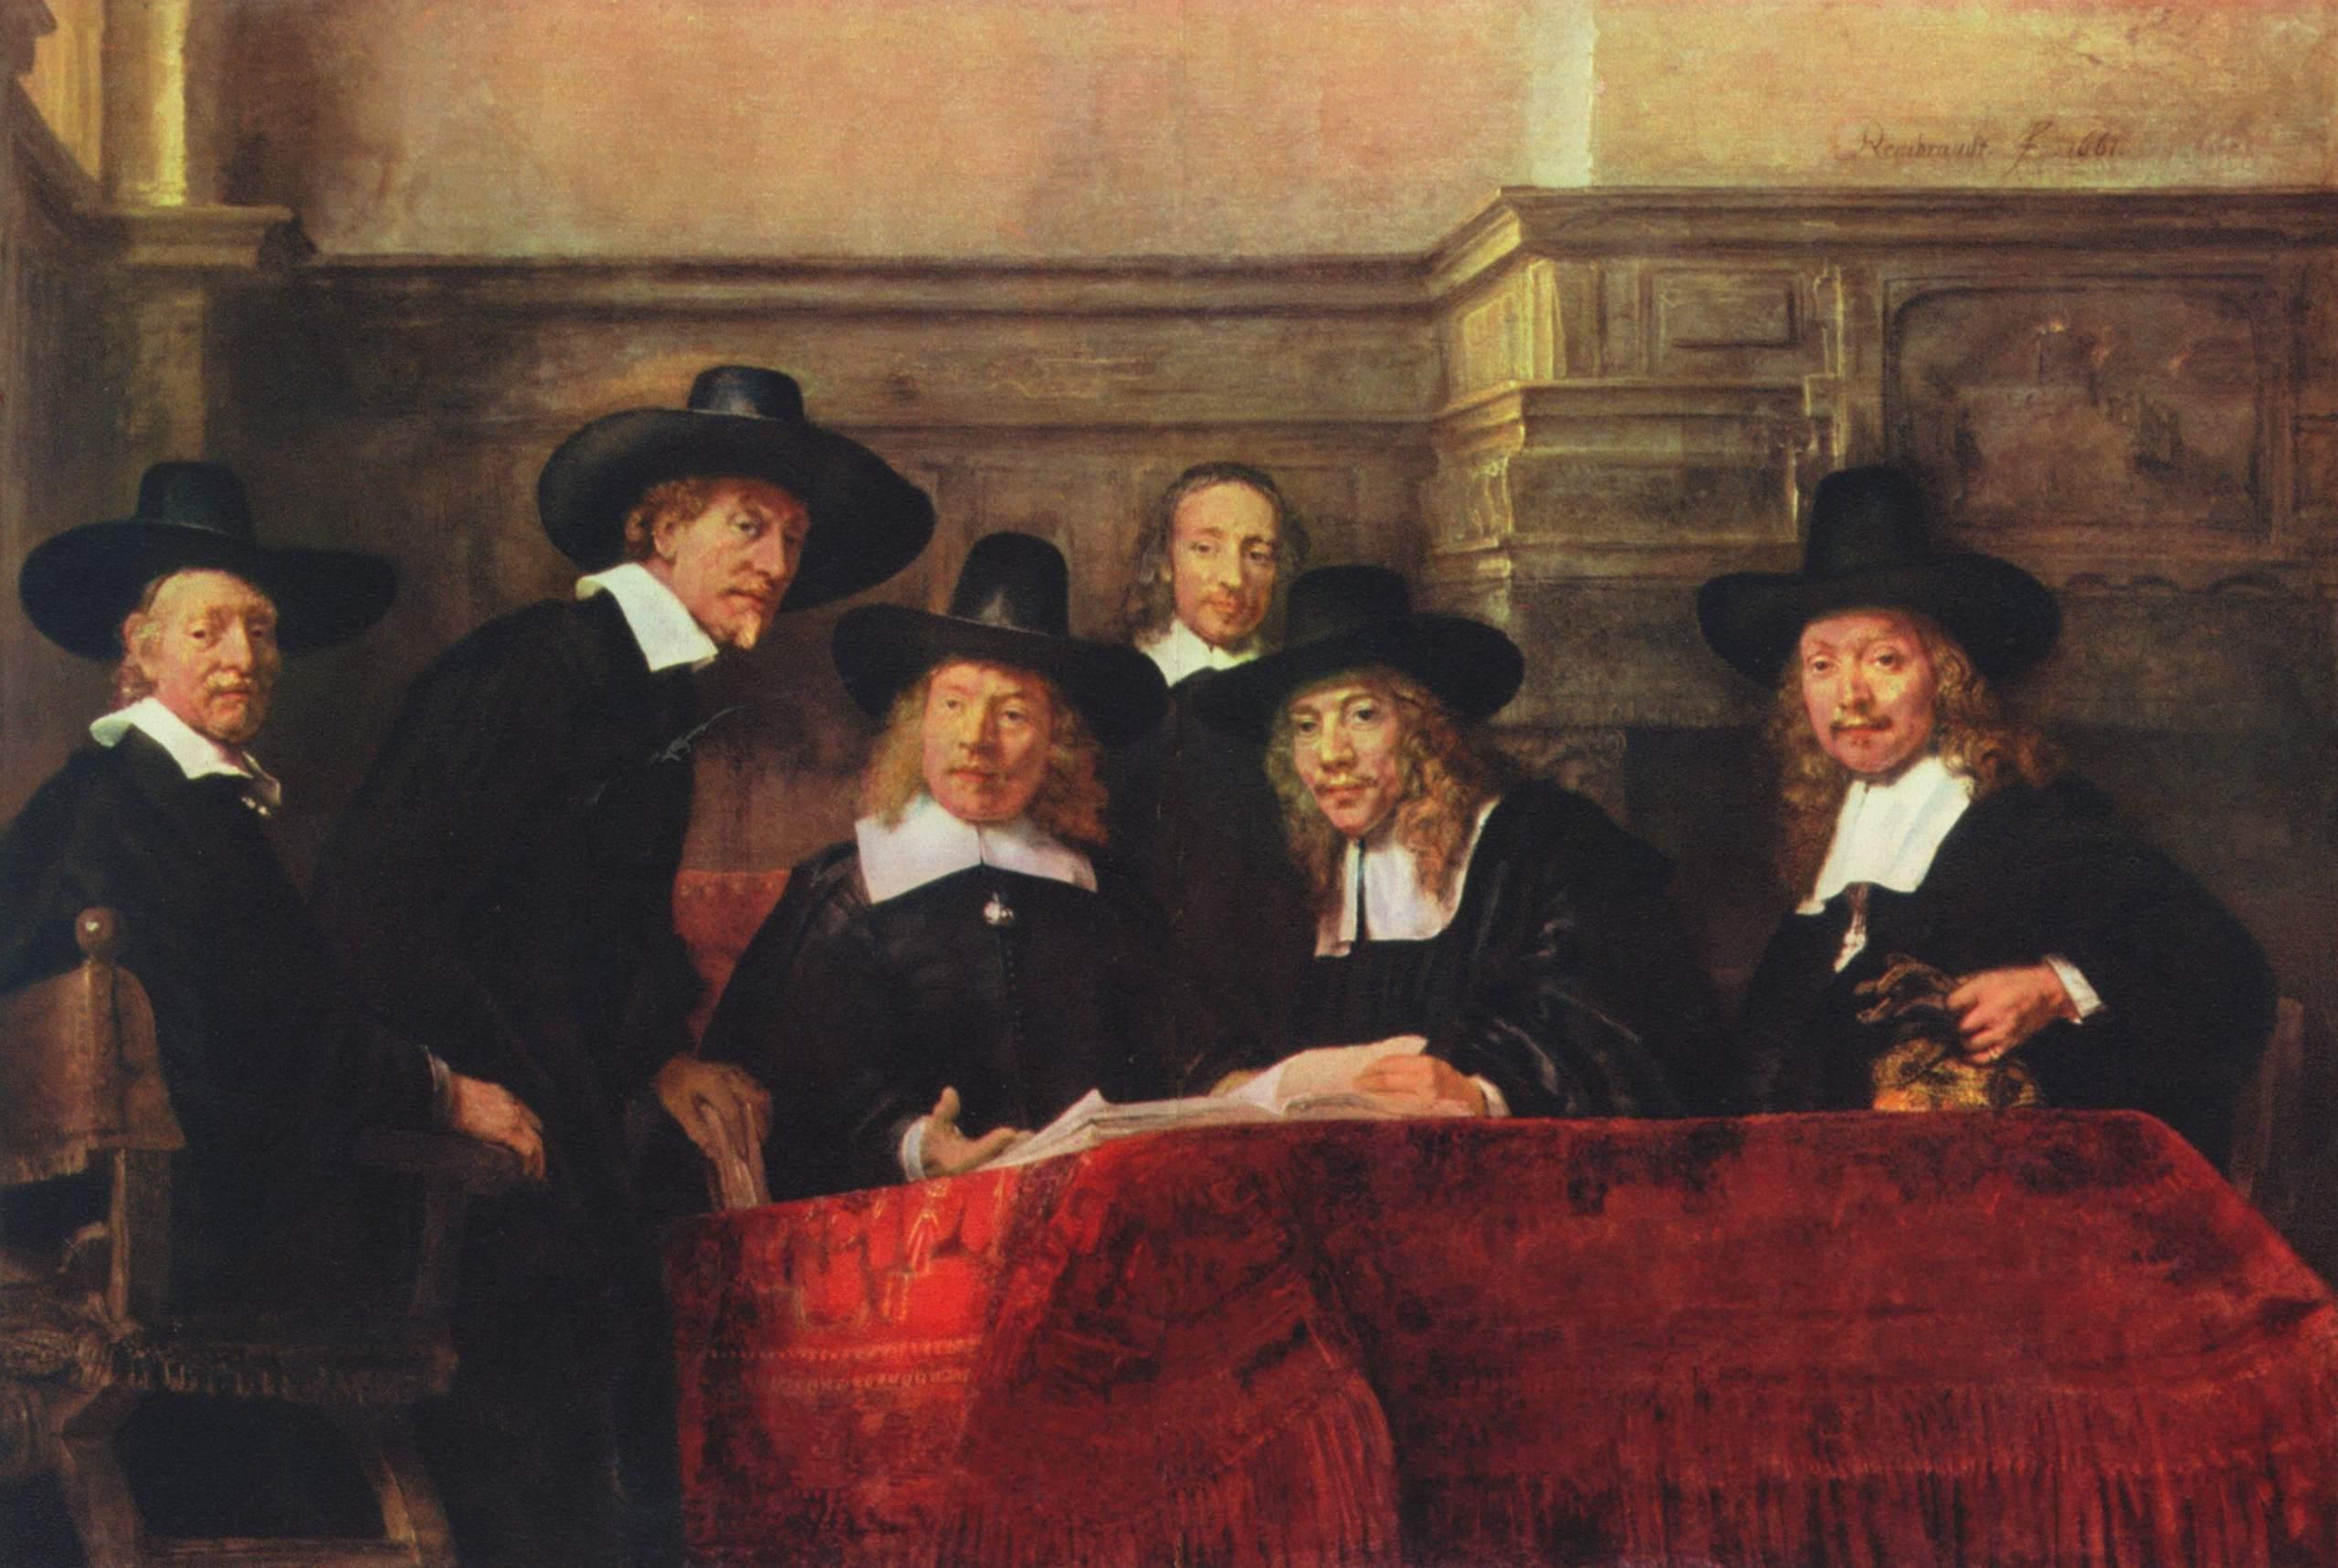 File:Rembrandt Harmensz. van Rijn 092.jpg - Wikimedia Commons